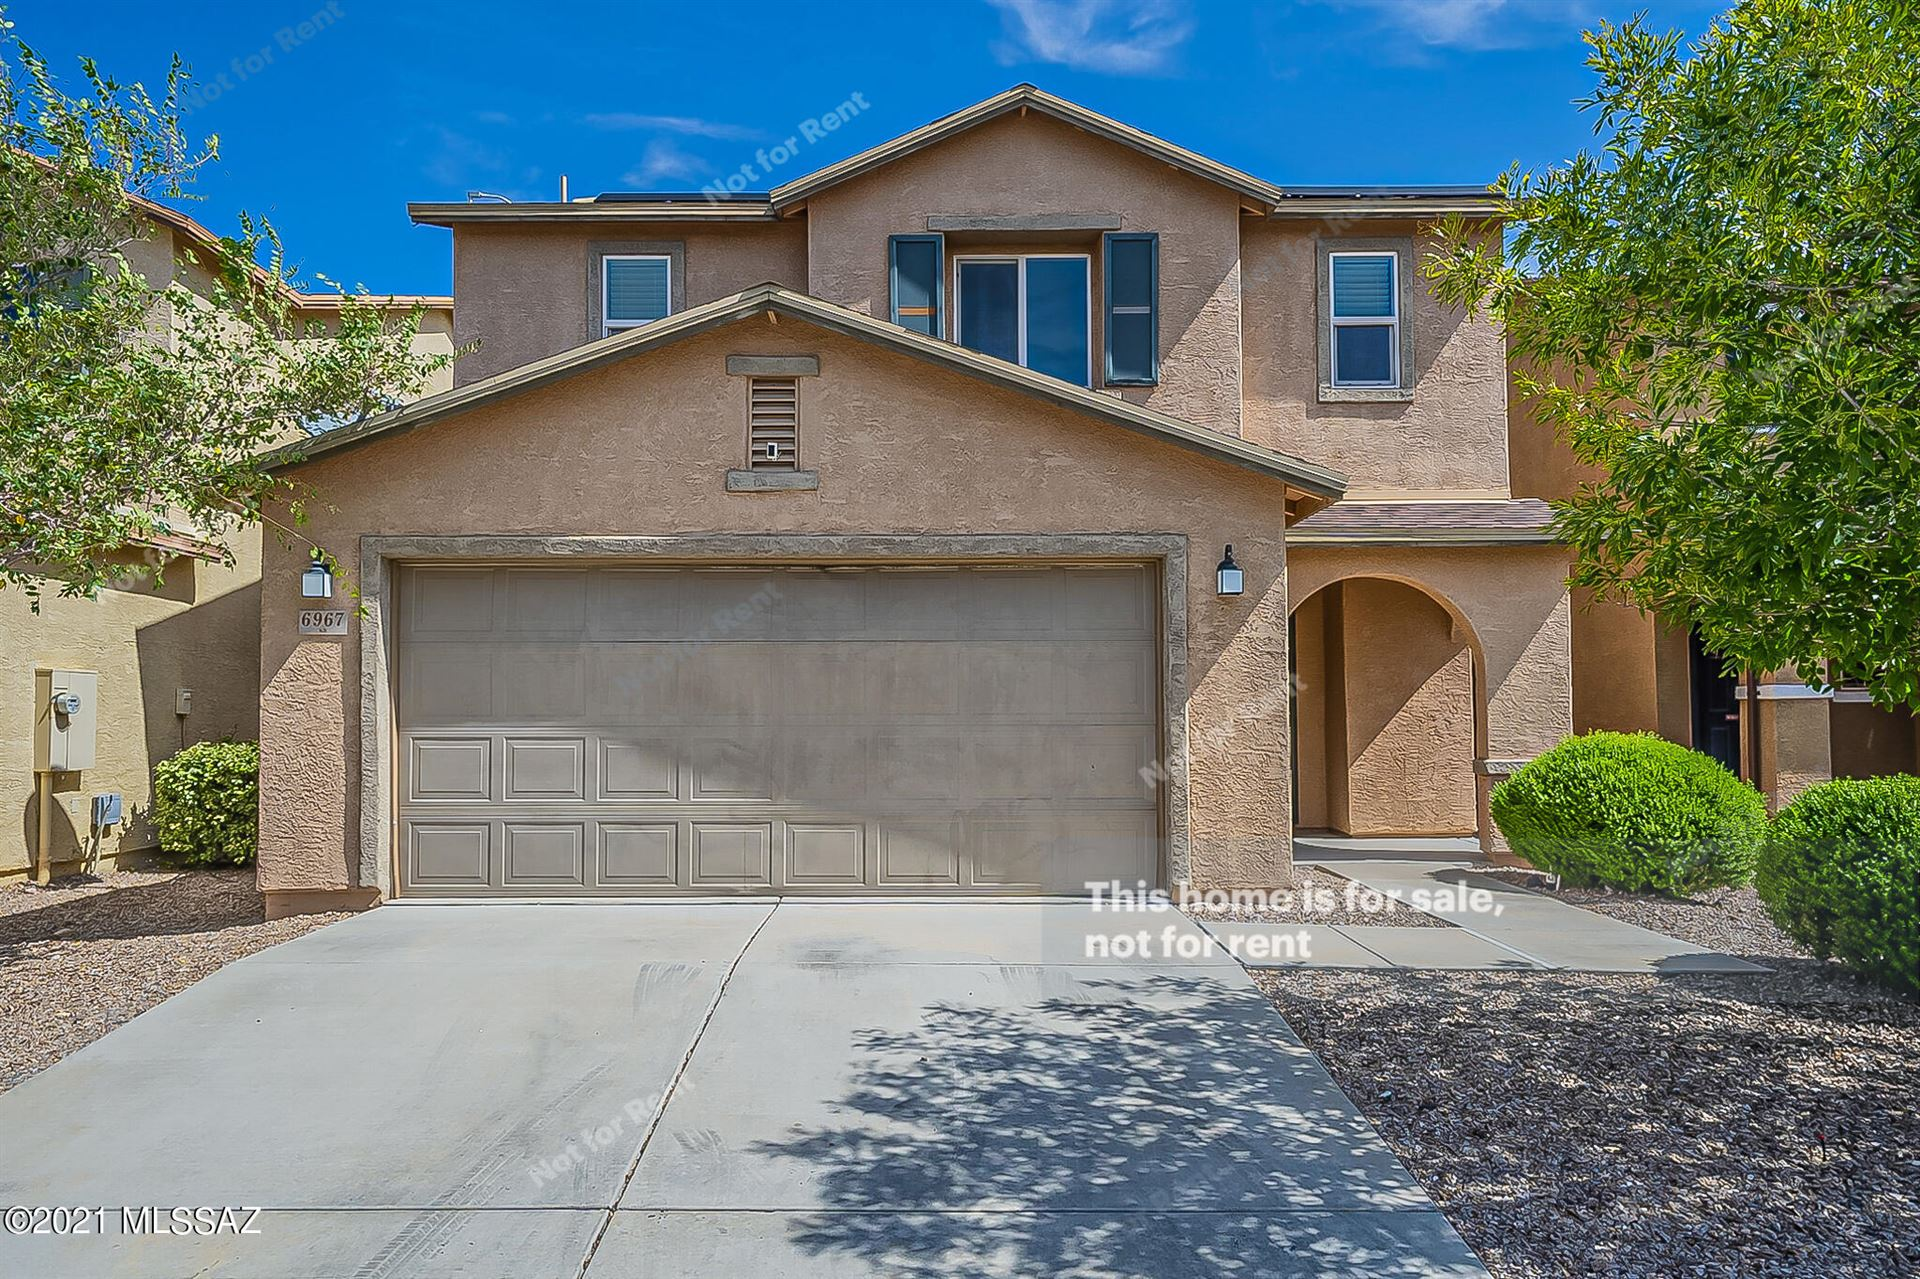 6967 S Red Maids Drive, Tucson, AZ 85756 - MLS#: 22124645